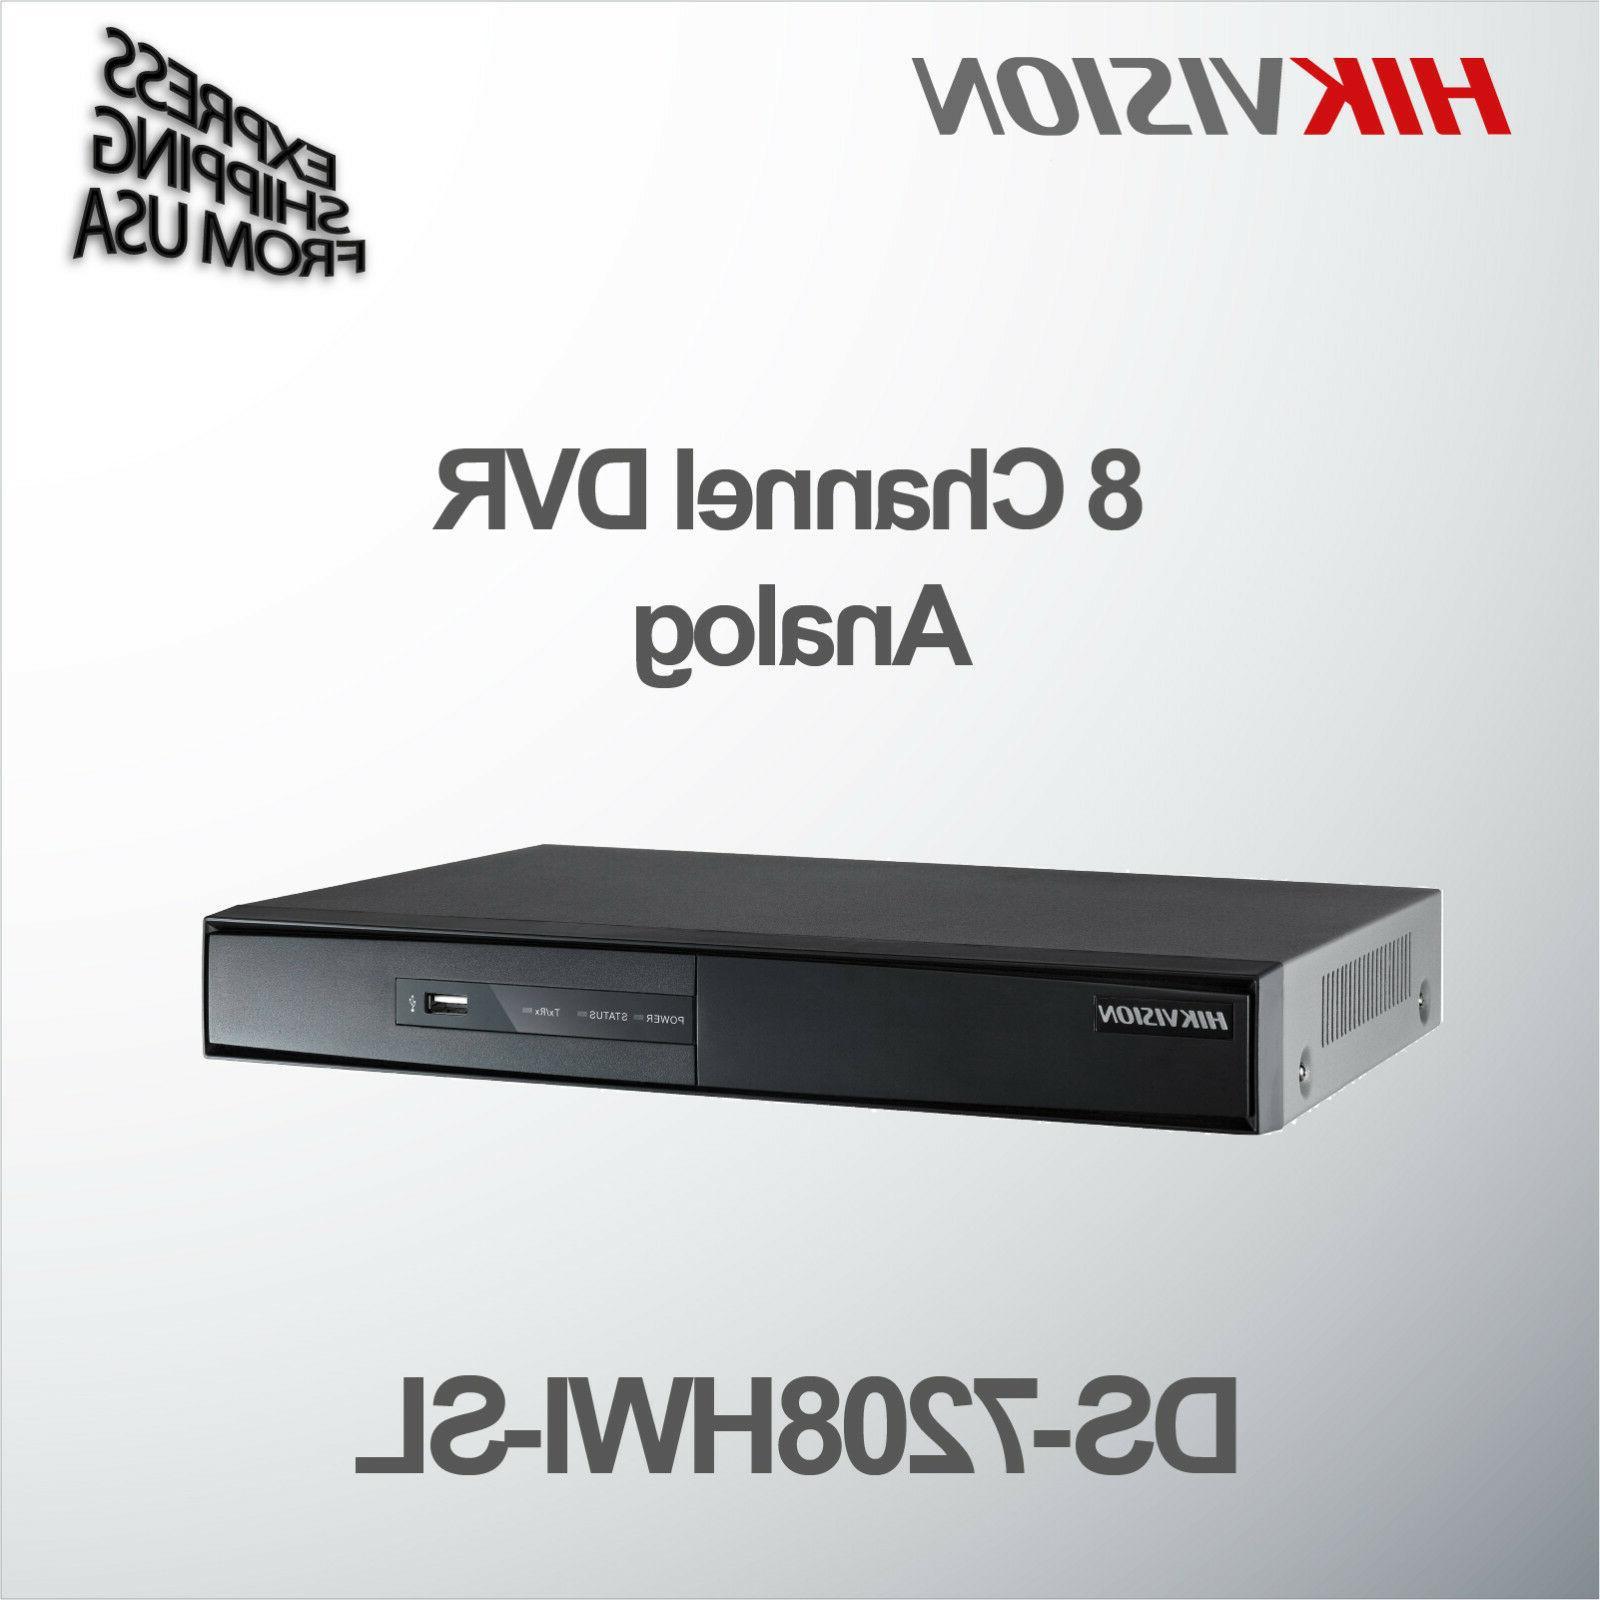 8 channel digital video recorder analog dvr